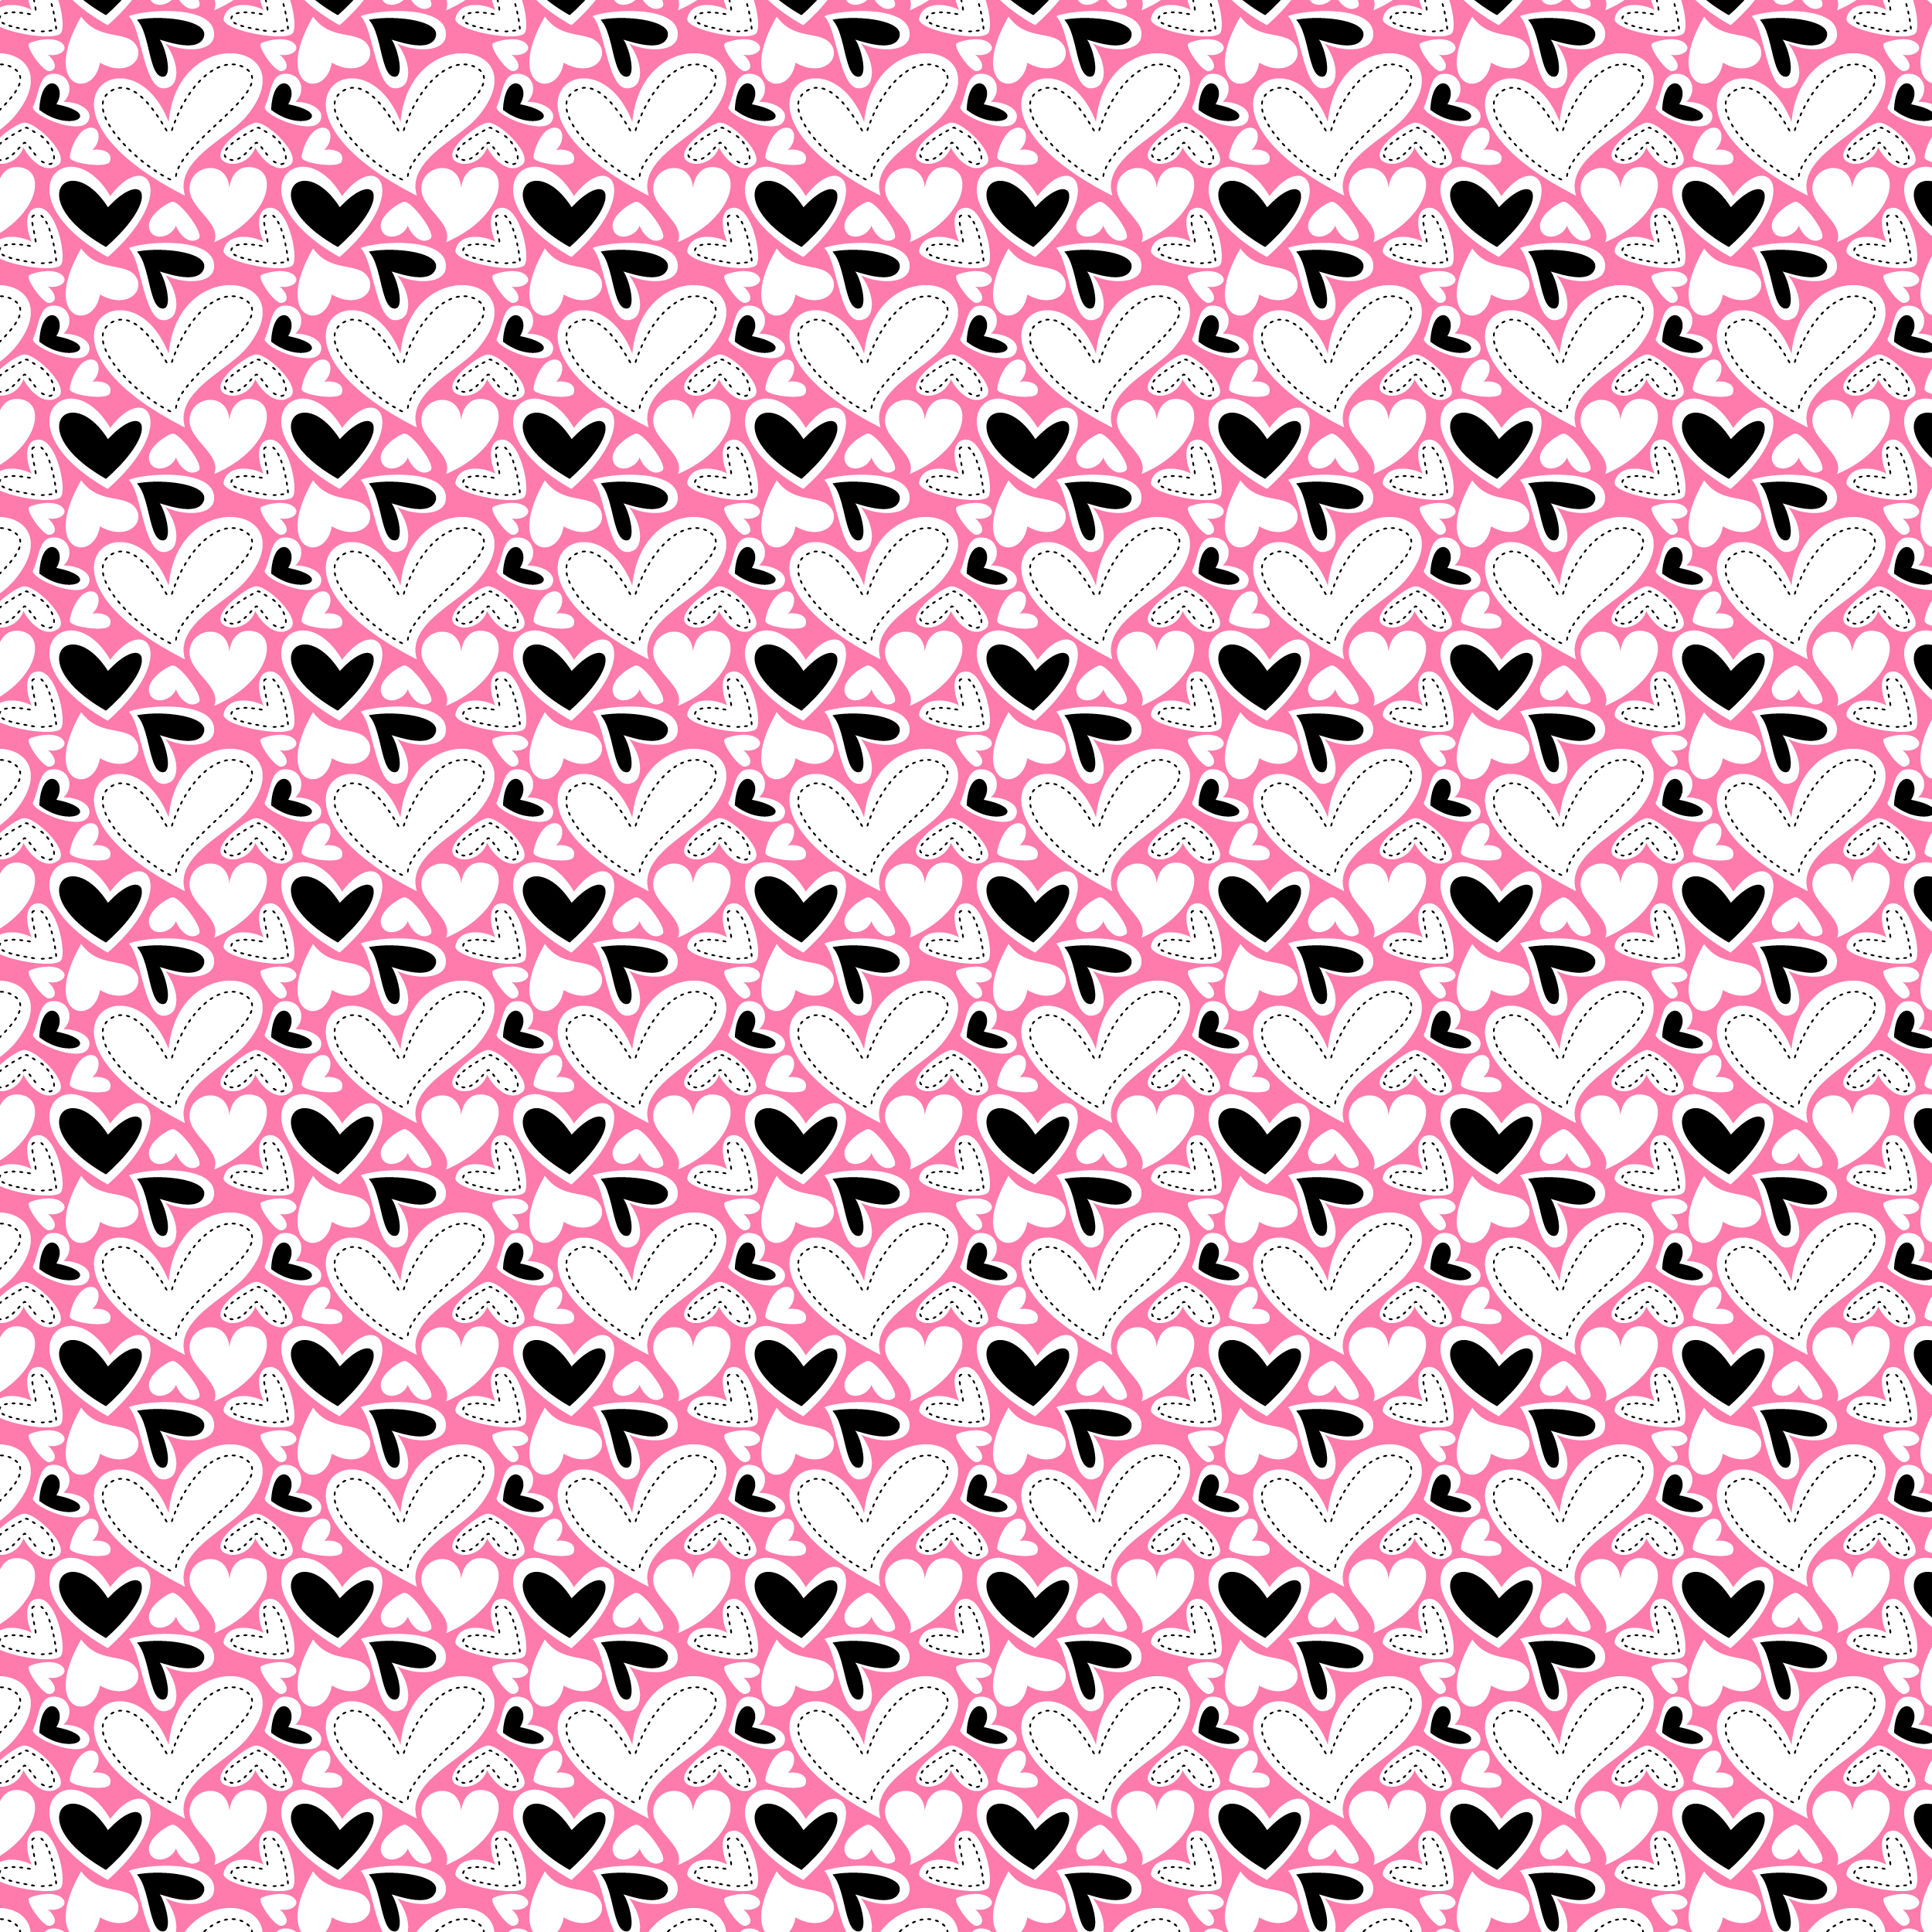 FabNFree-3111-StitchyHearts-PinkBlack-Paper